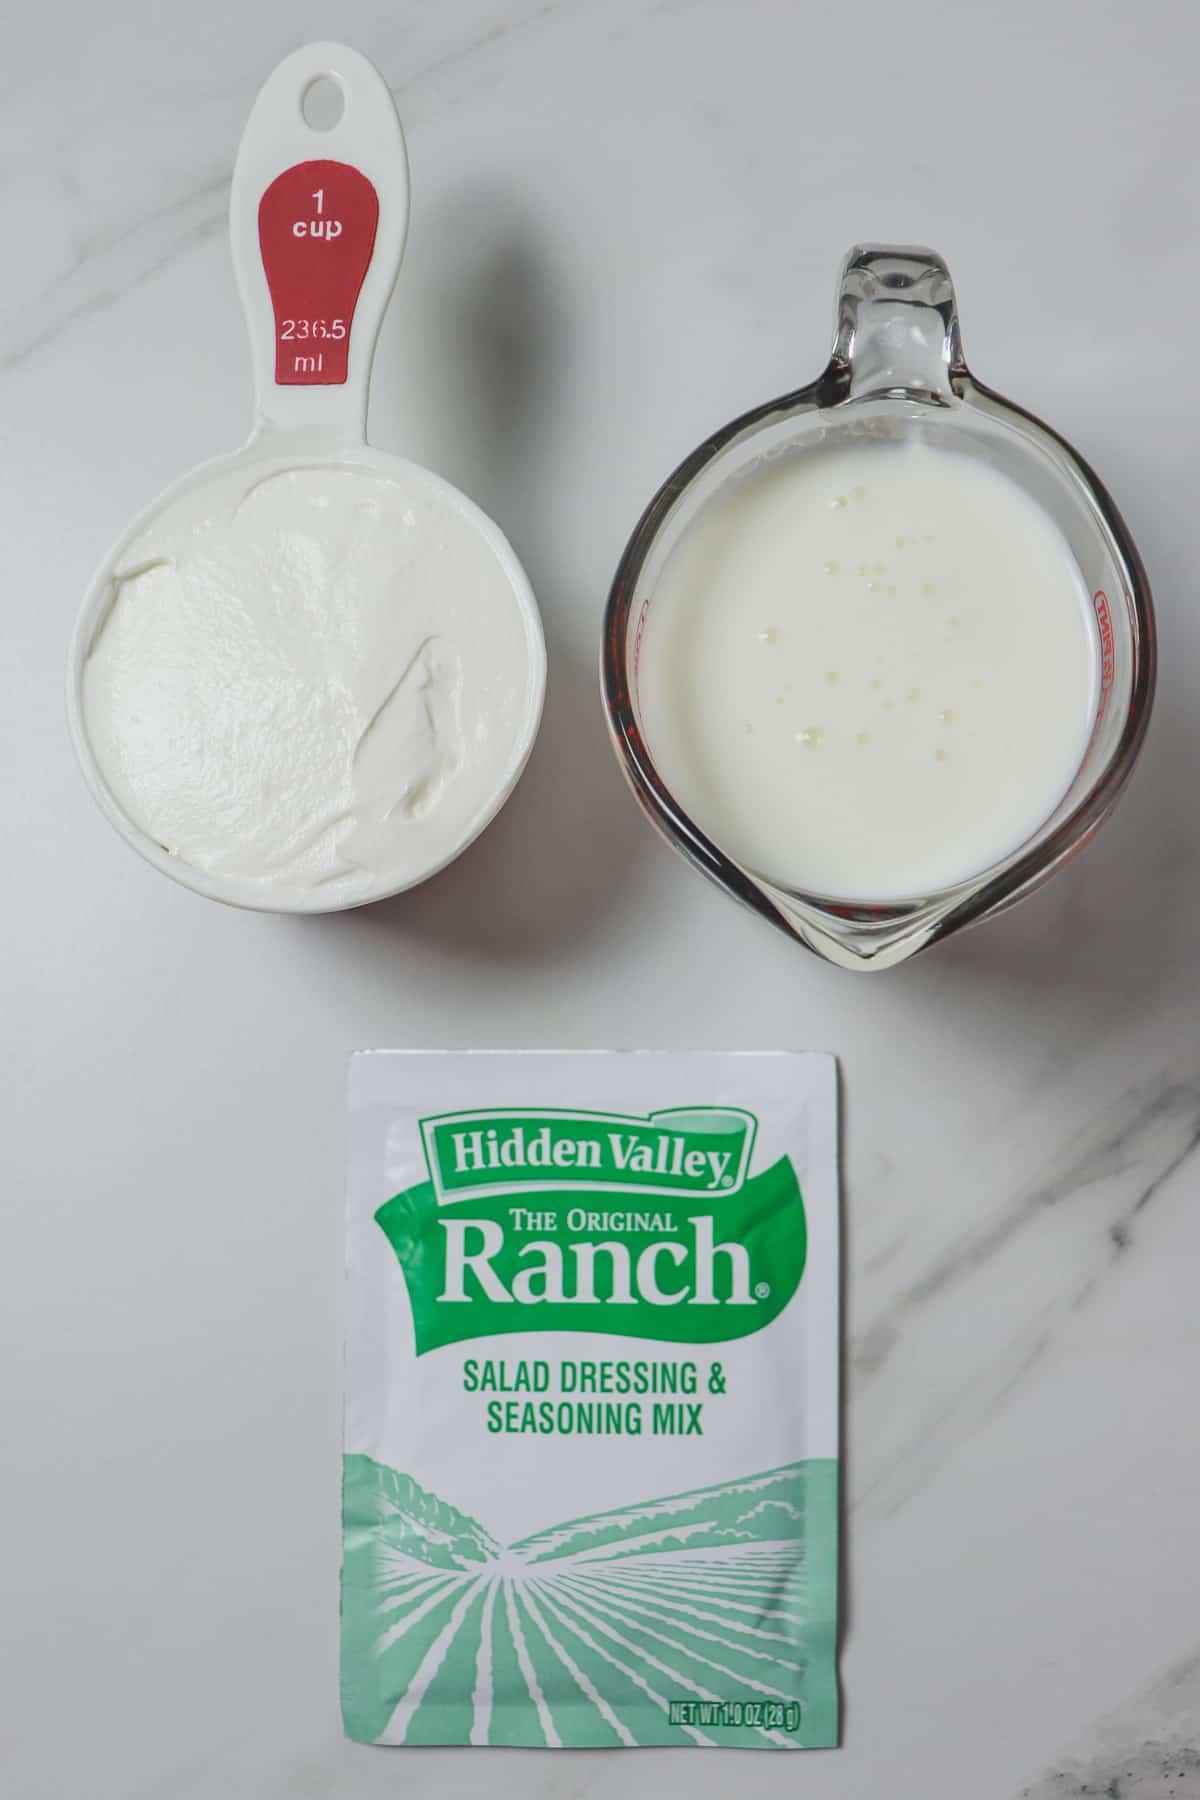 ingredients in low calorie buttermilk ranch dip